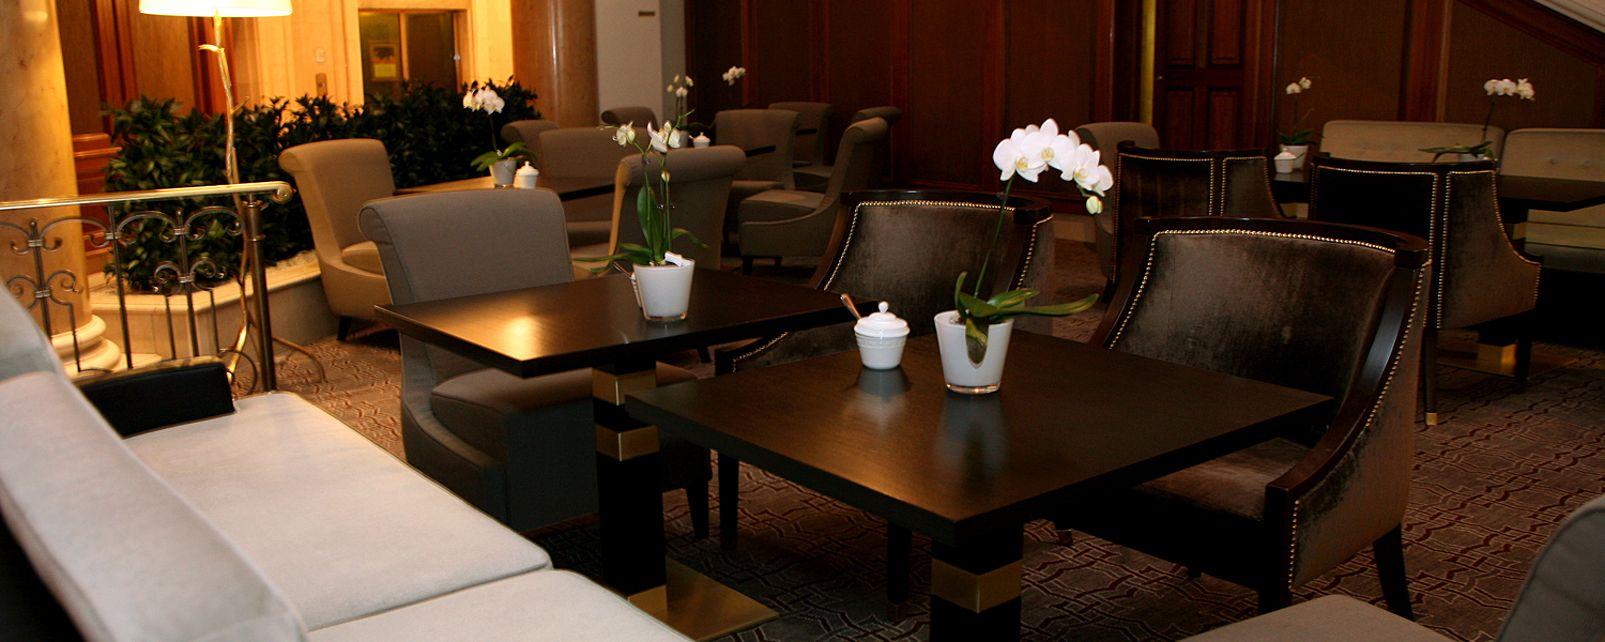 Hotel Westin Grand Hotel